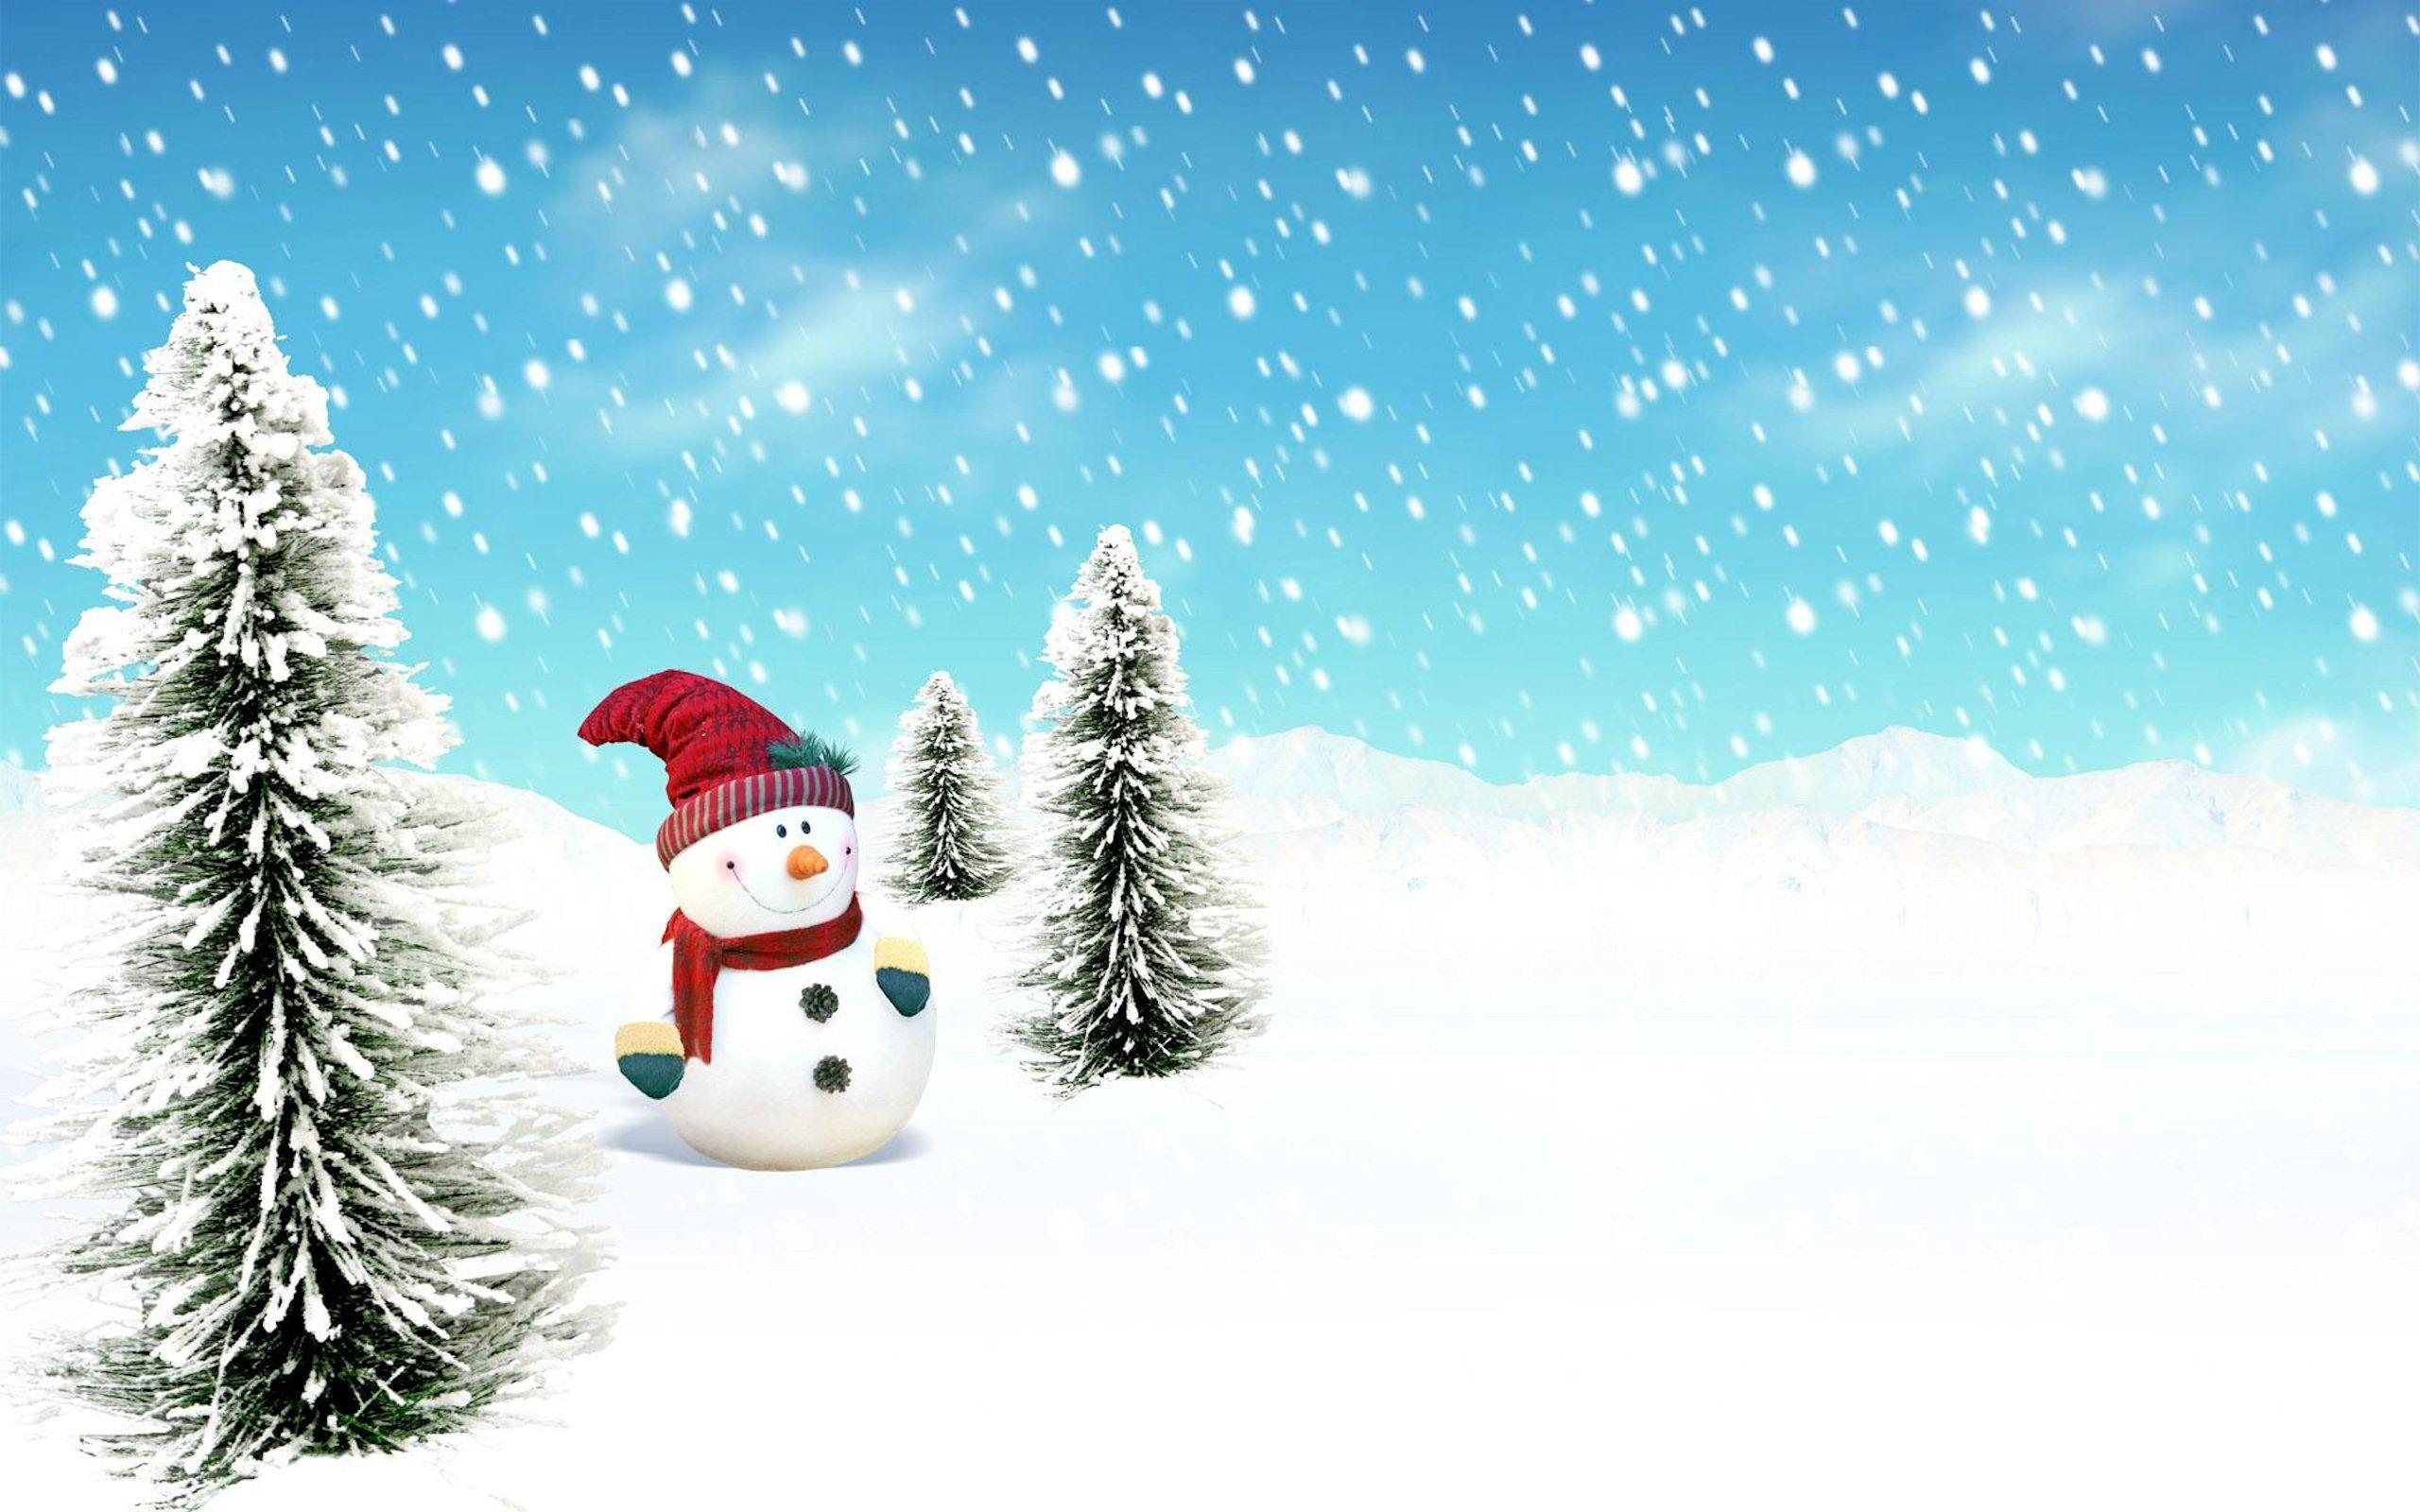 Winter Landscape Vector Wallpaper Pack Download Free